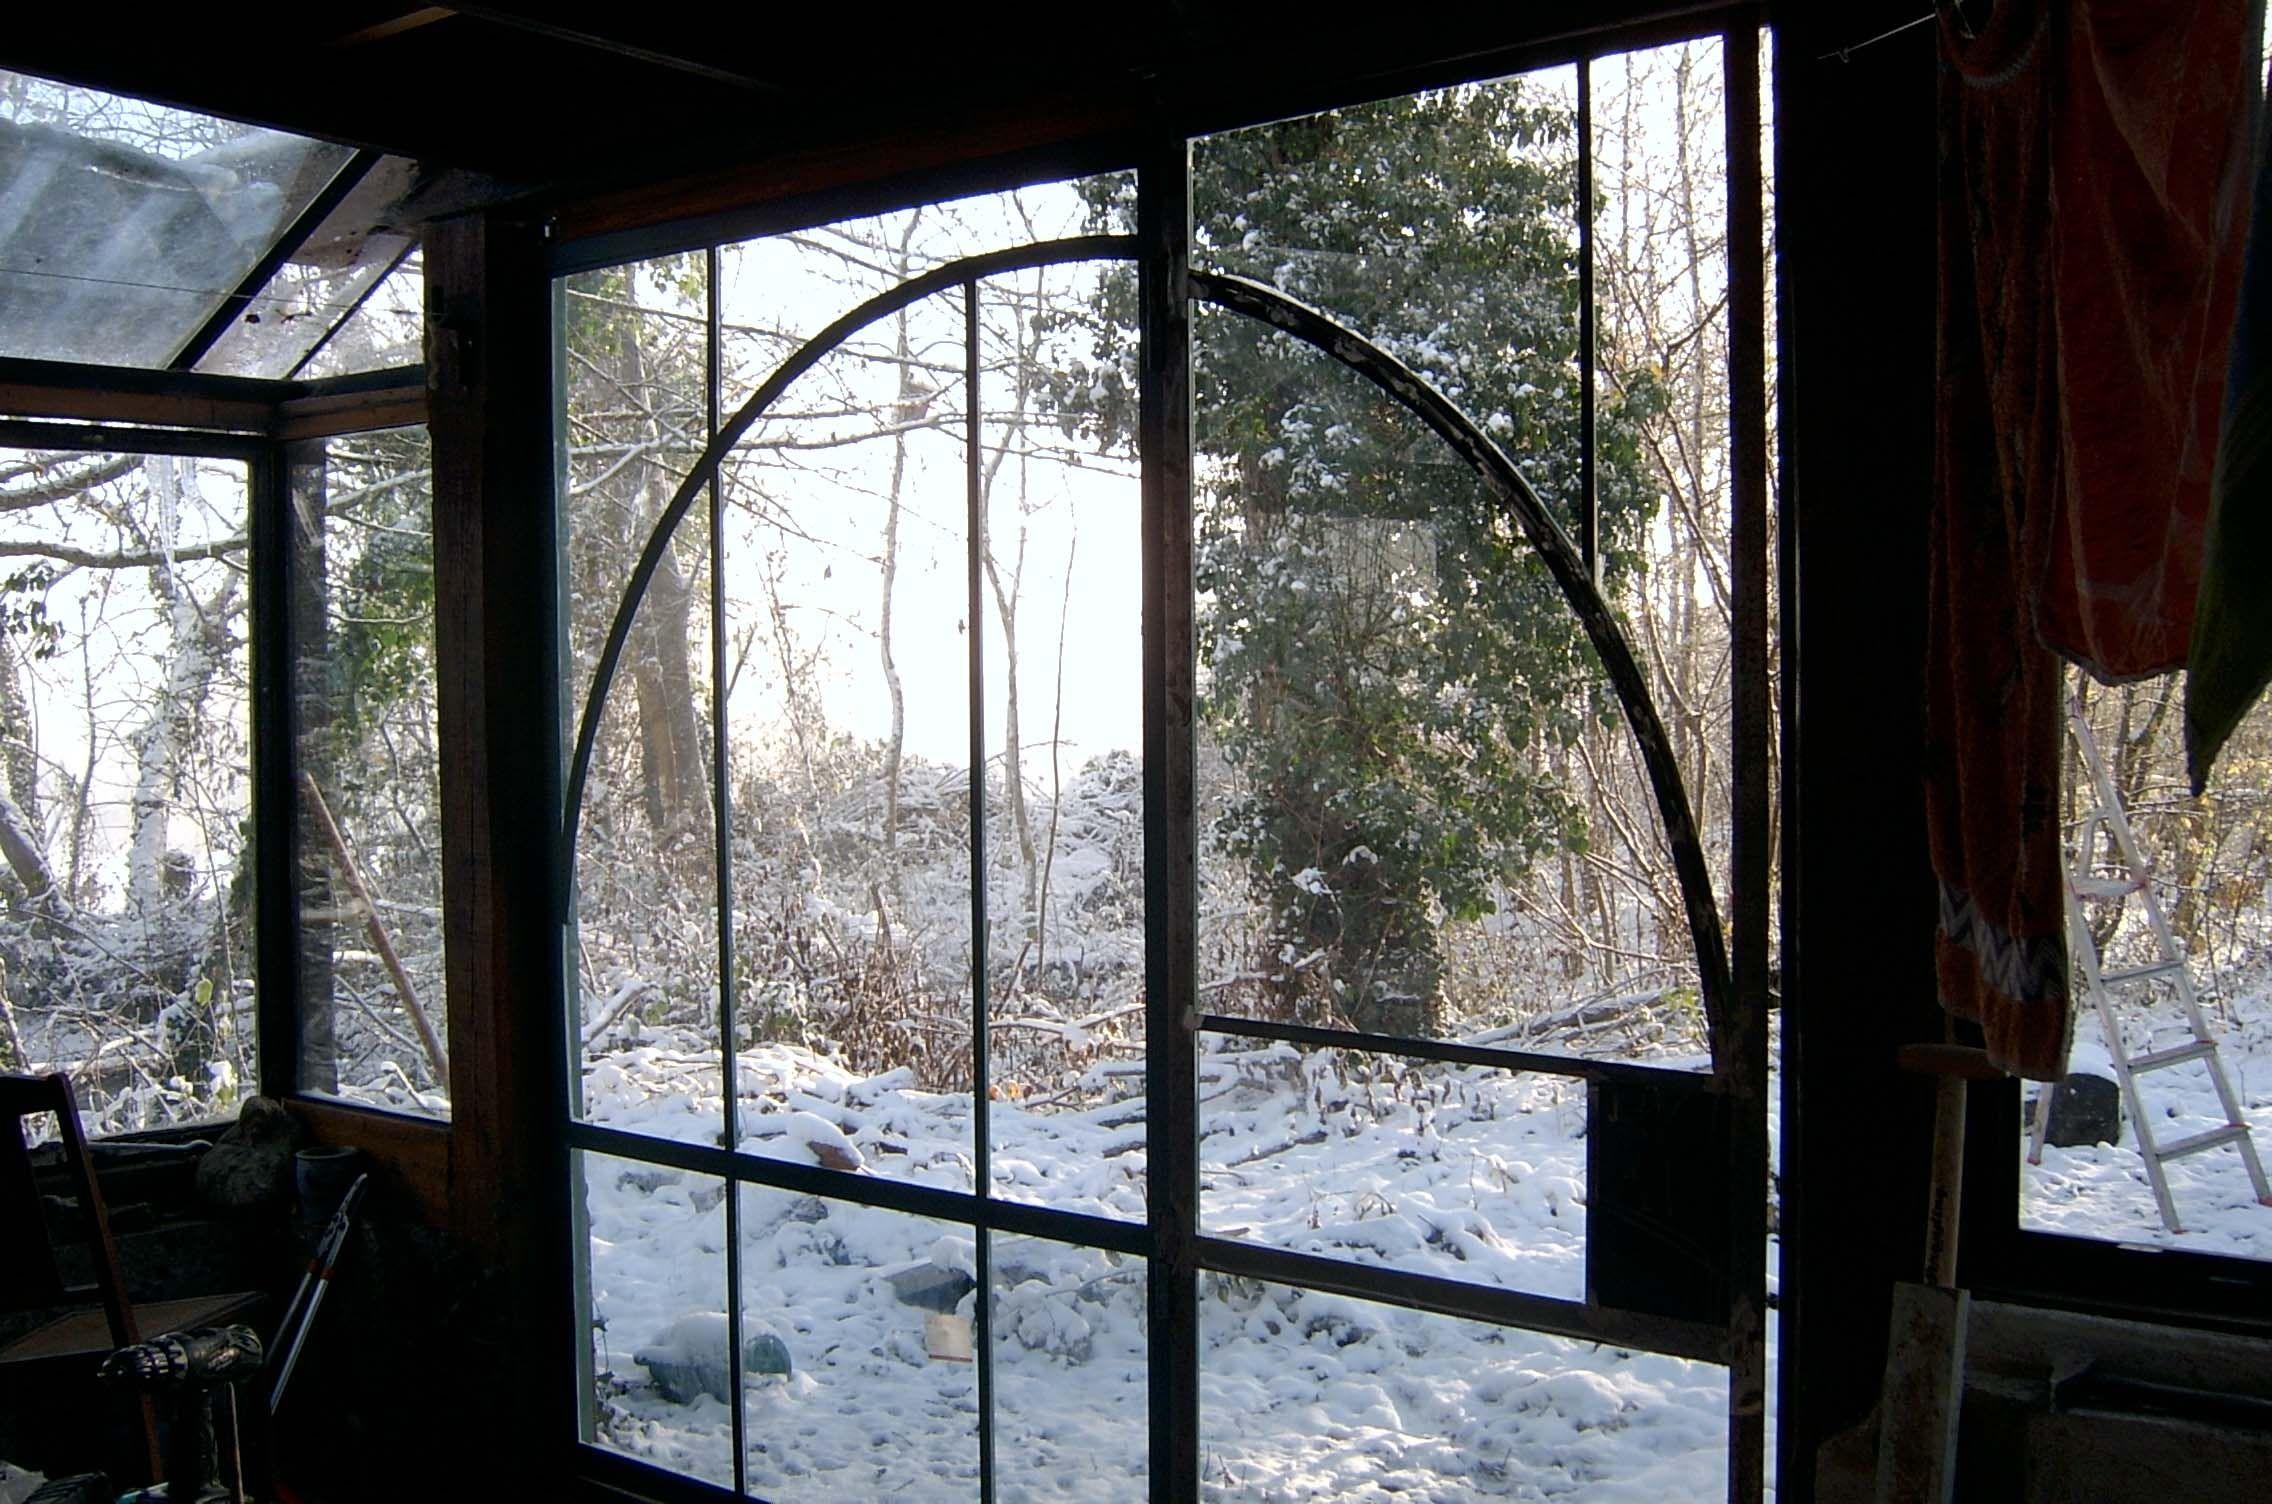 veranda | Que des Beaux Arts | Verriere, Veranda et Art